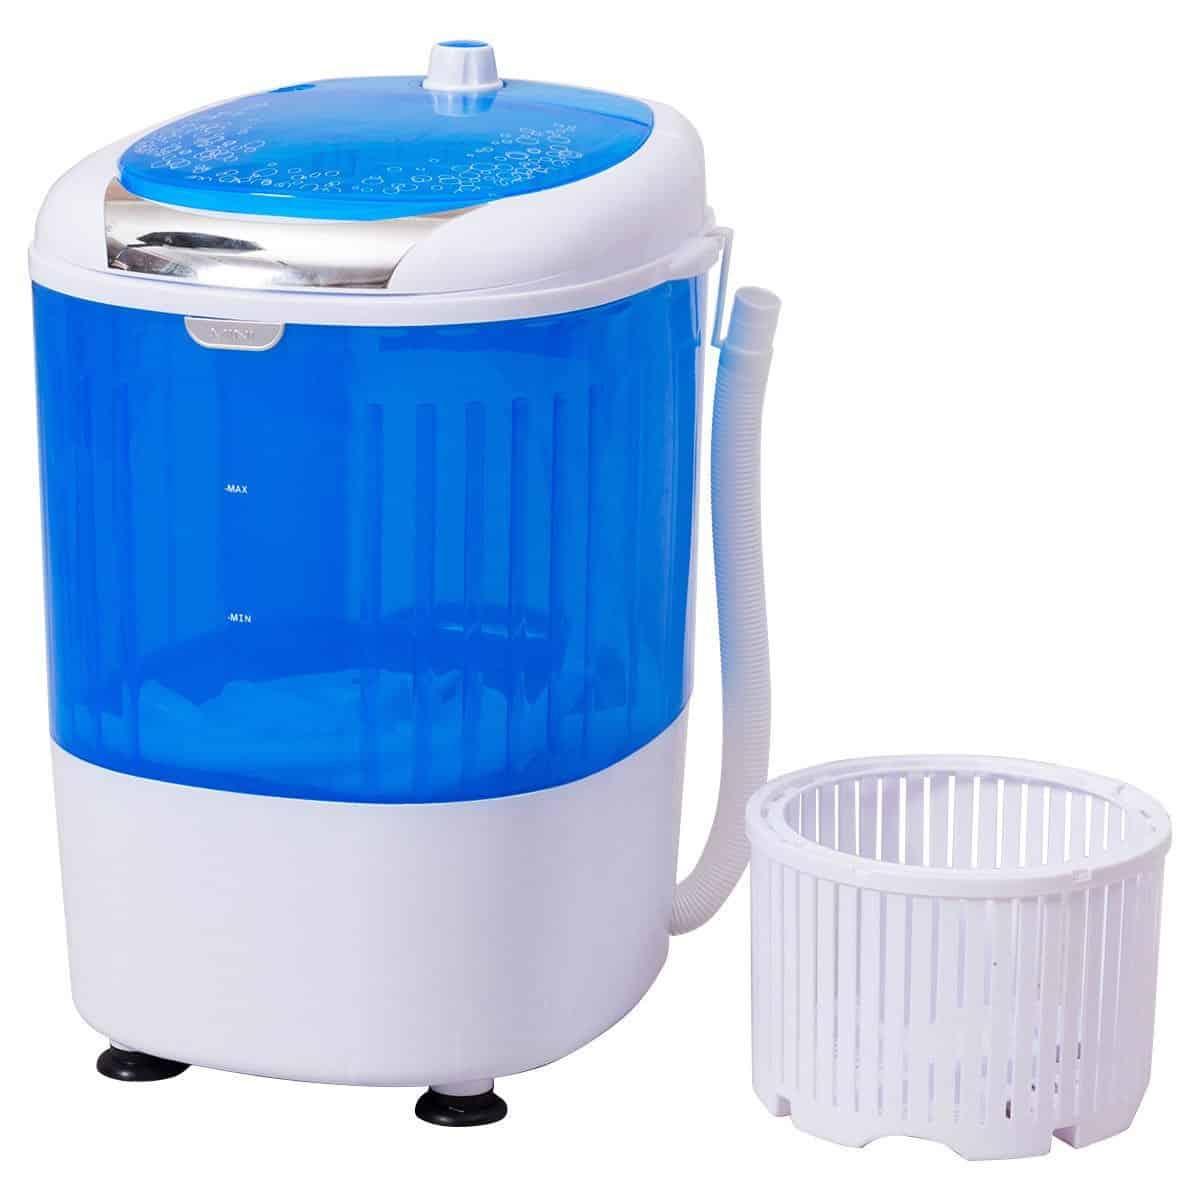 Costway Portable mini washing machine